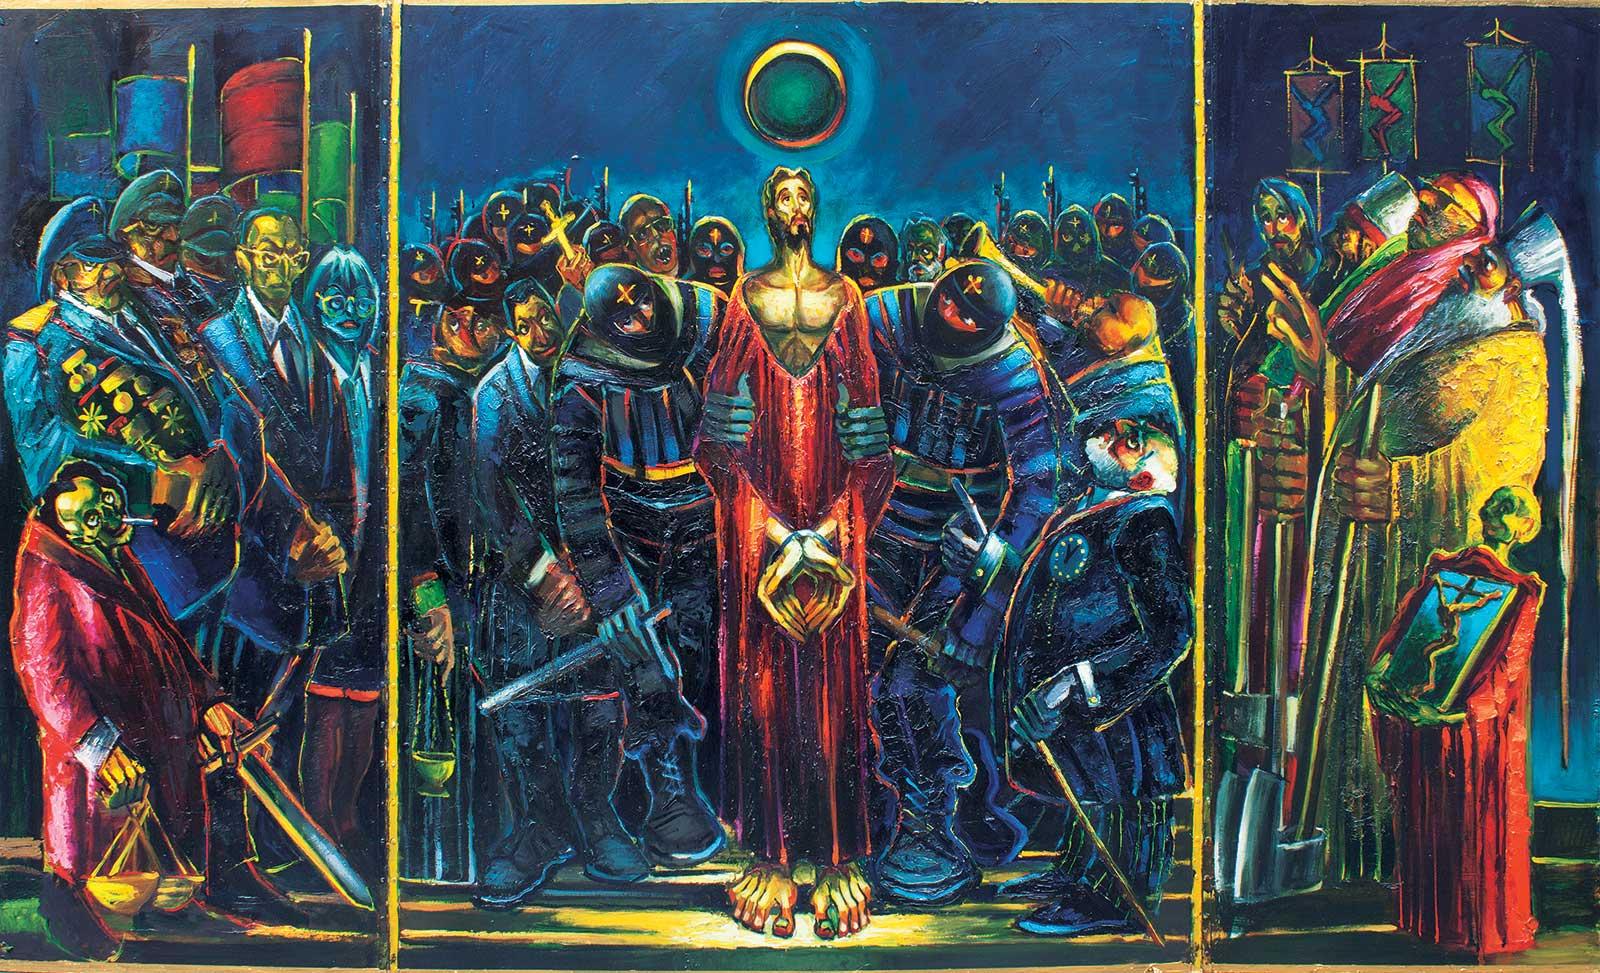 Vadimir GEORGIEVSKI, Triptych, acrylic on panel